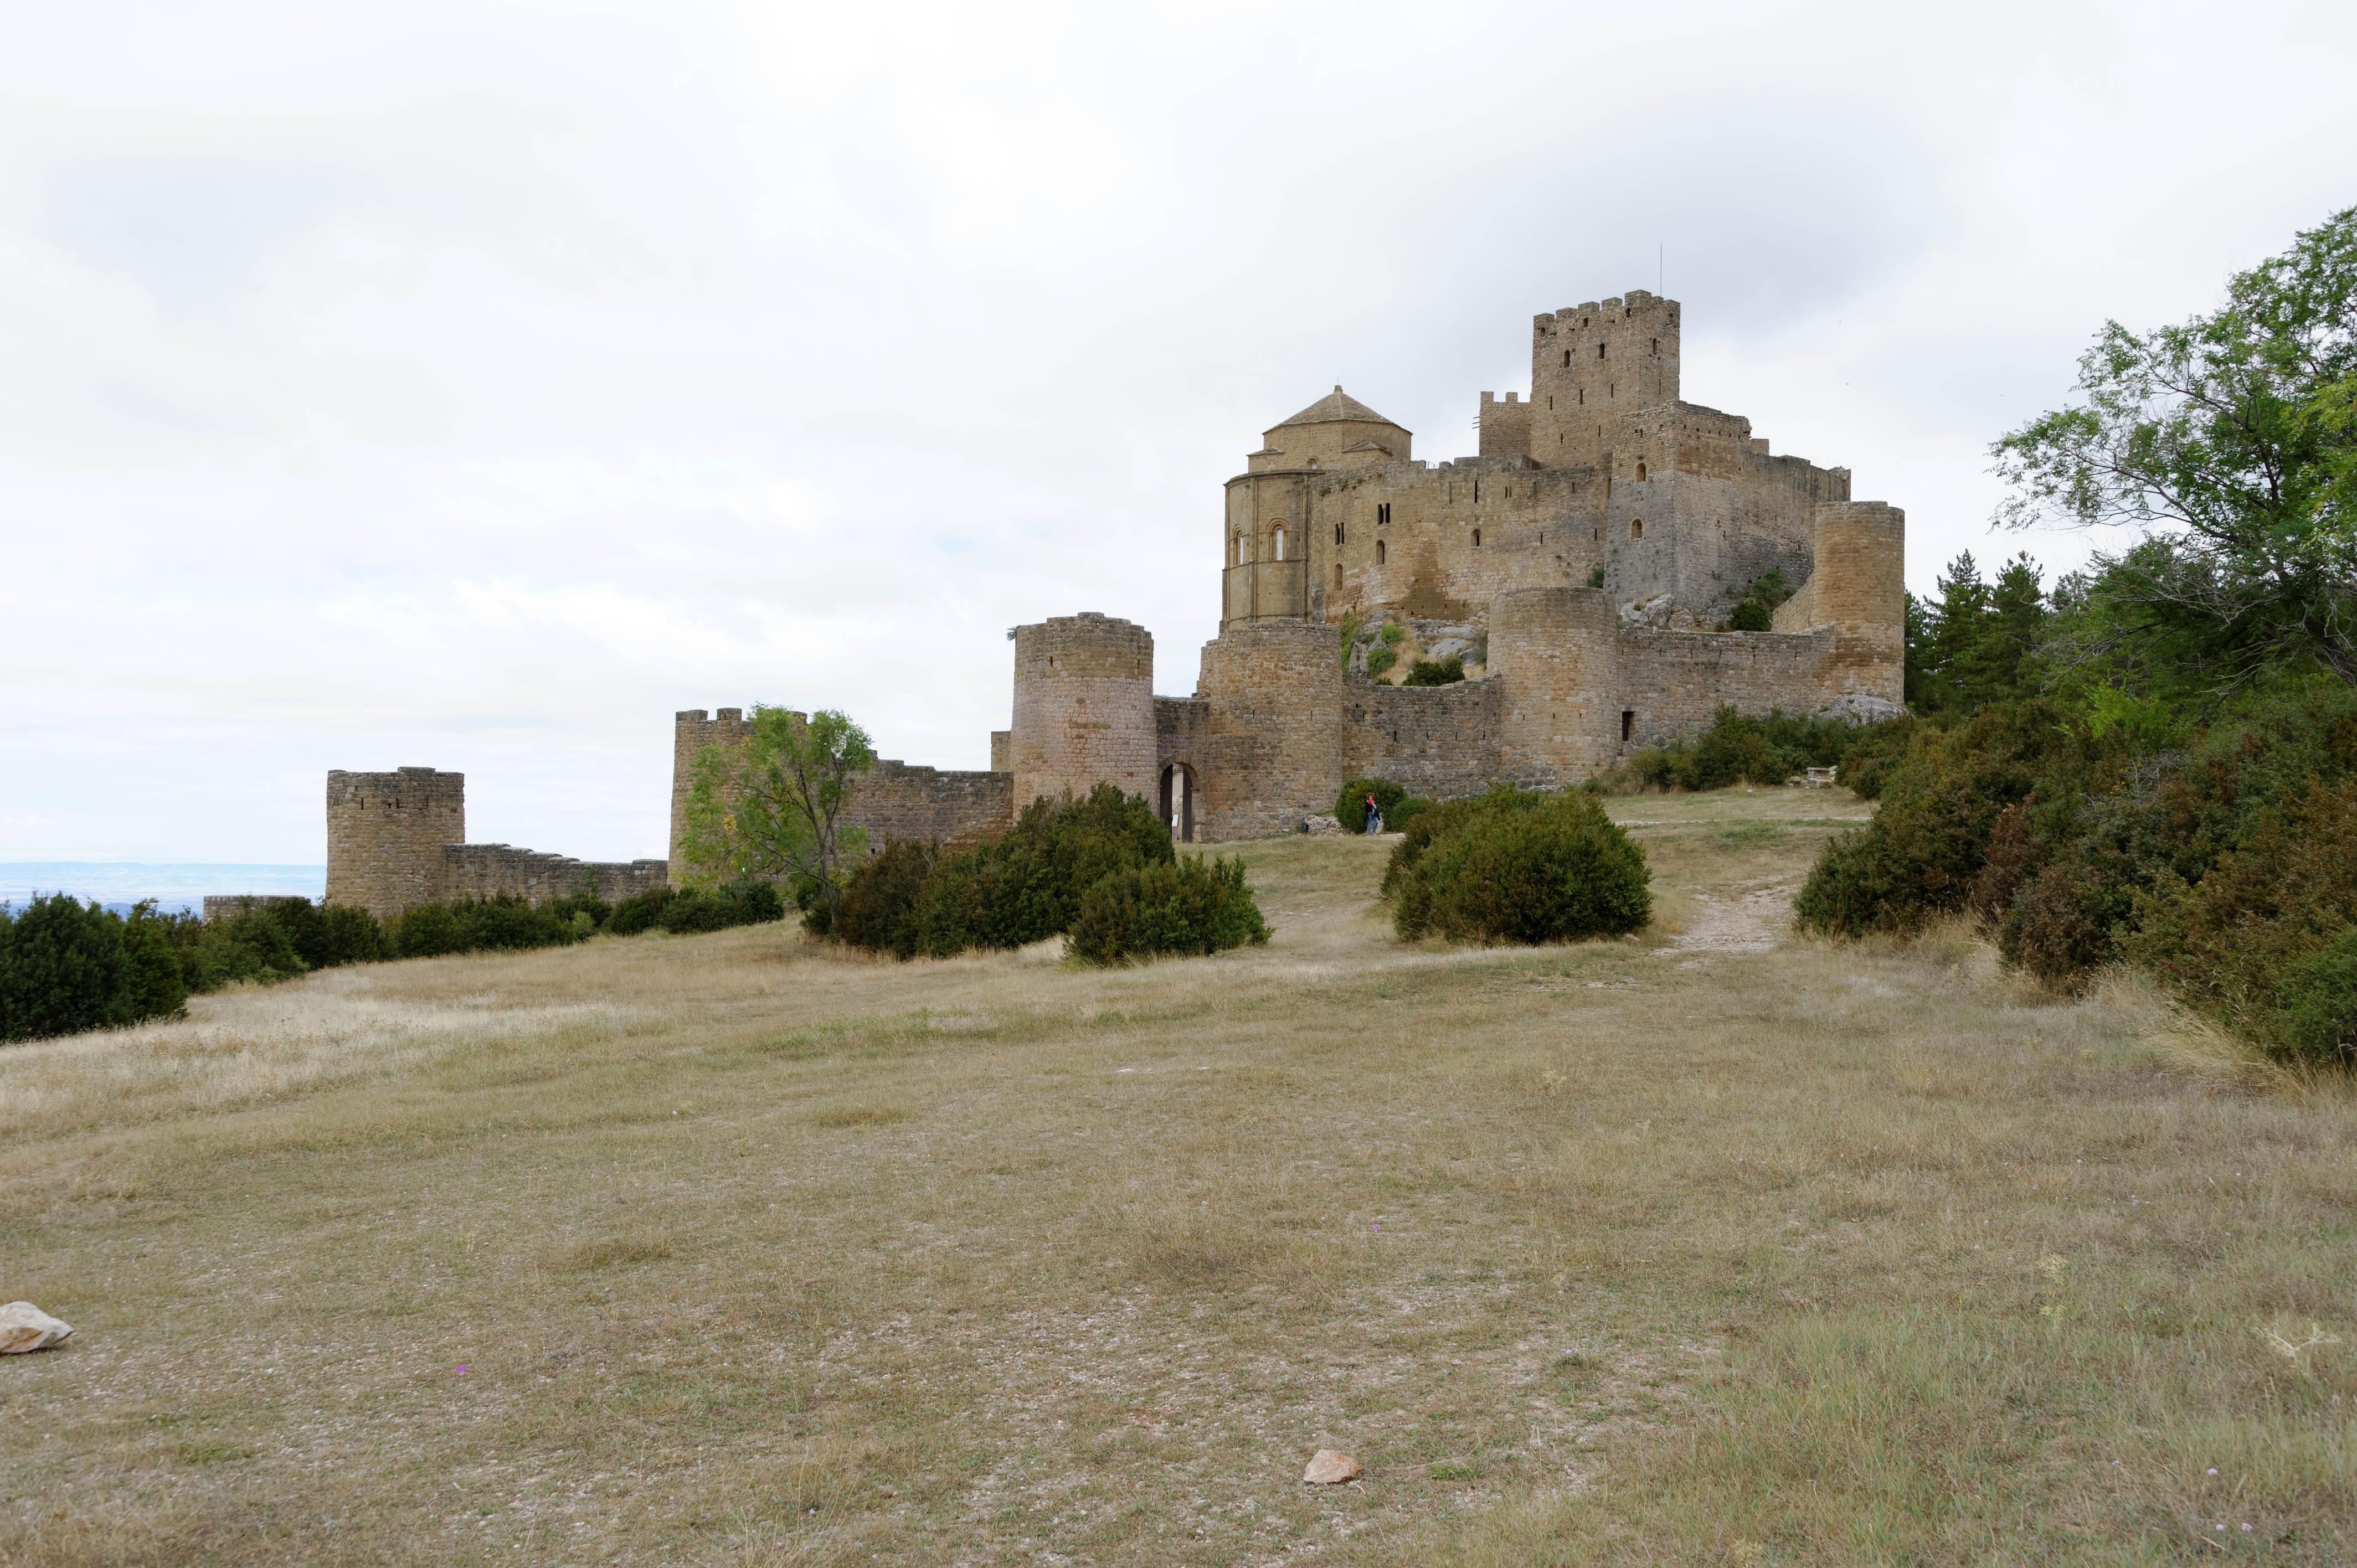 3727_Chateau de Loarre (Aragon)